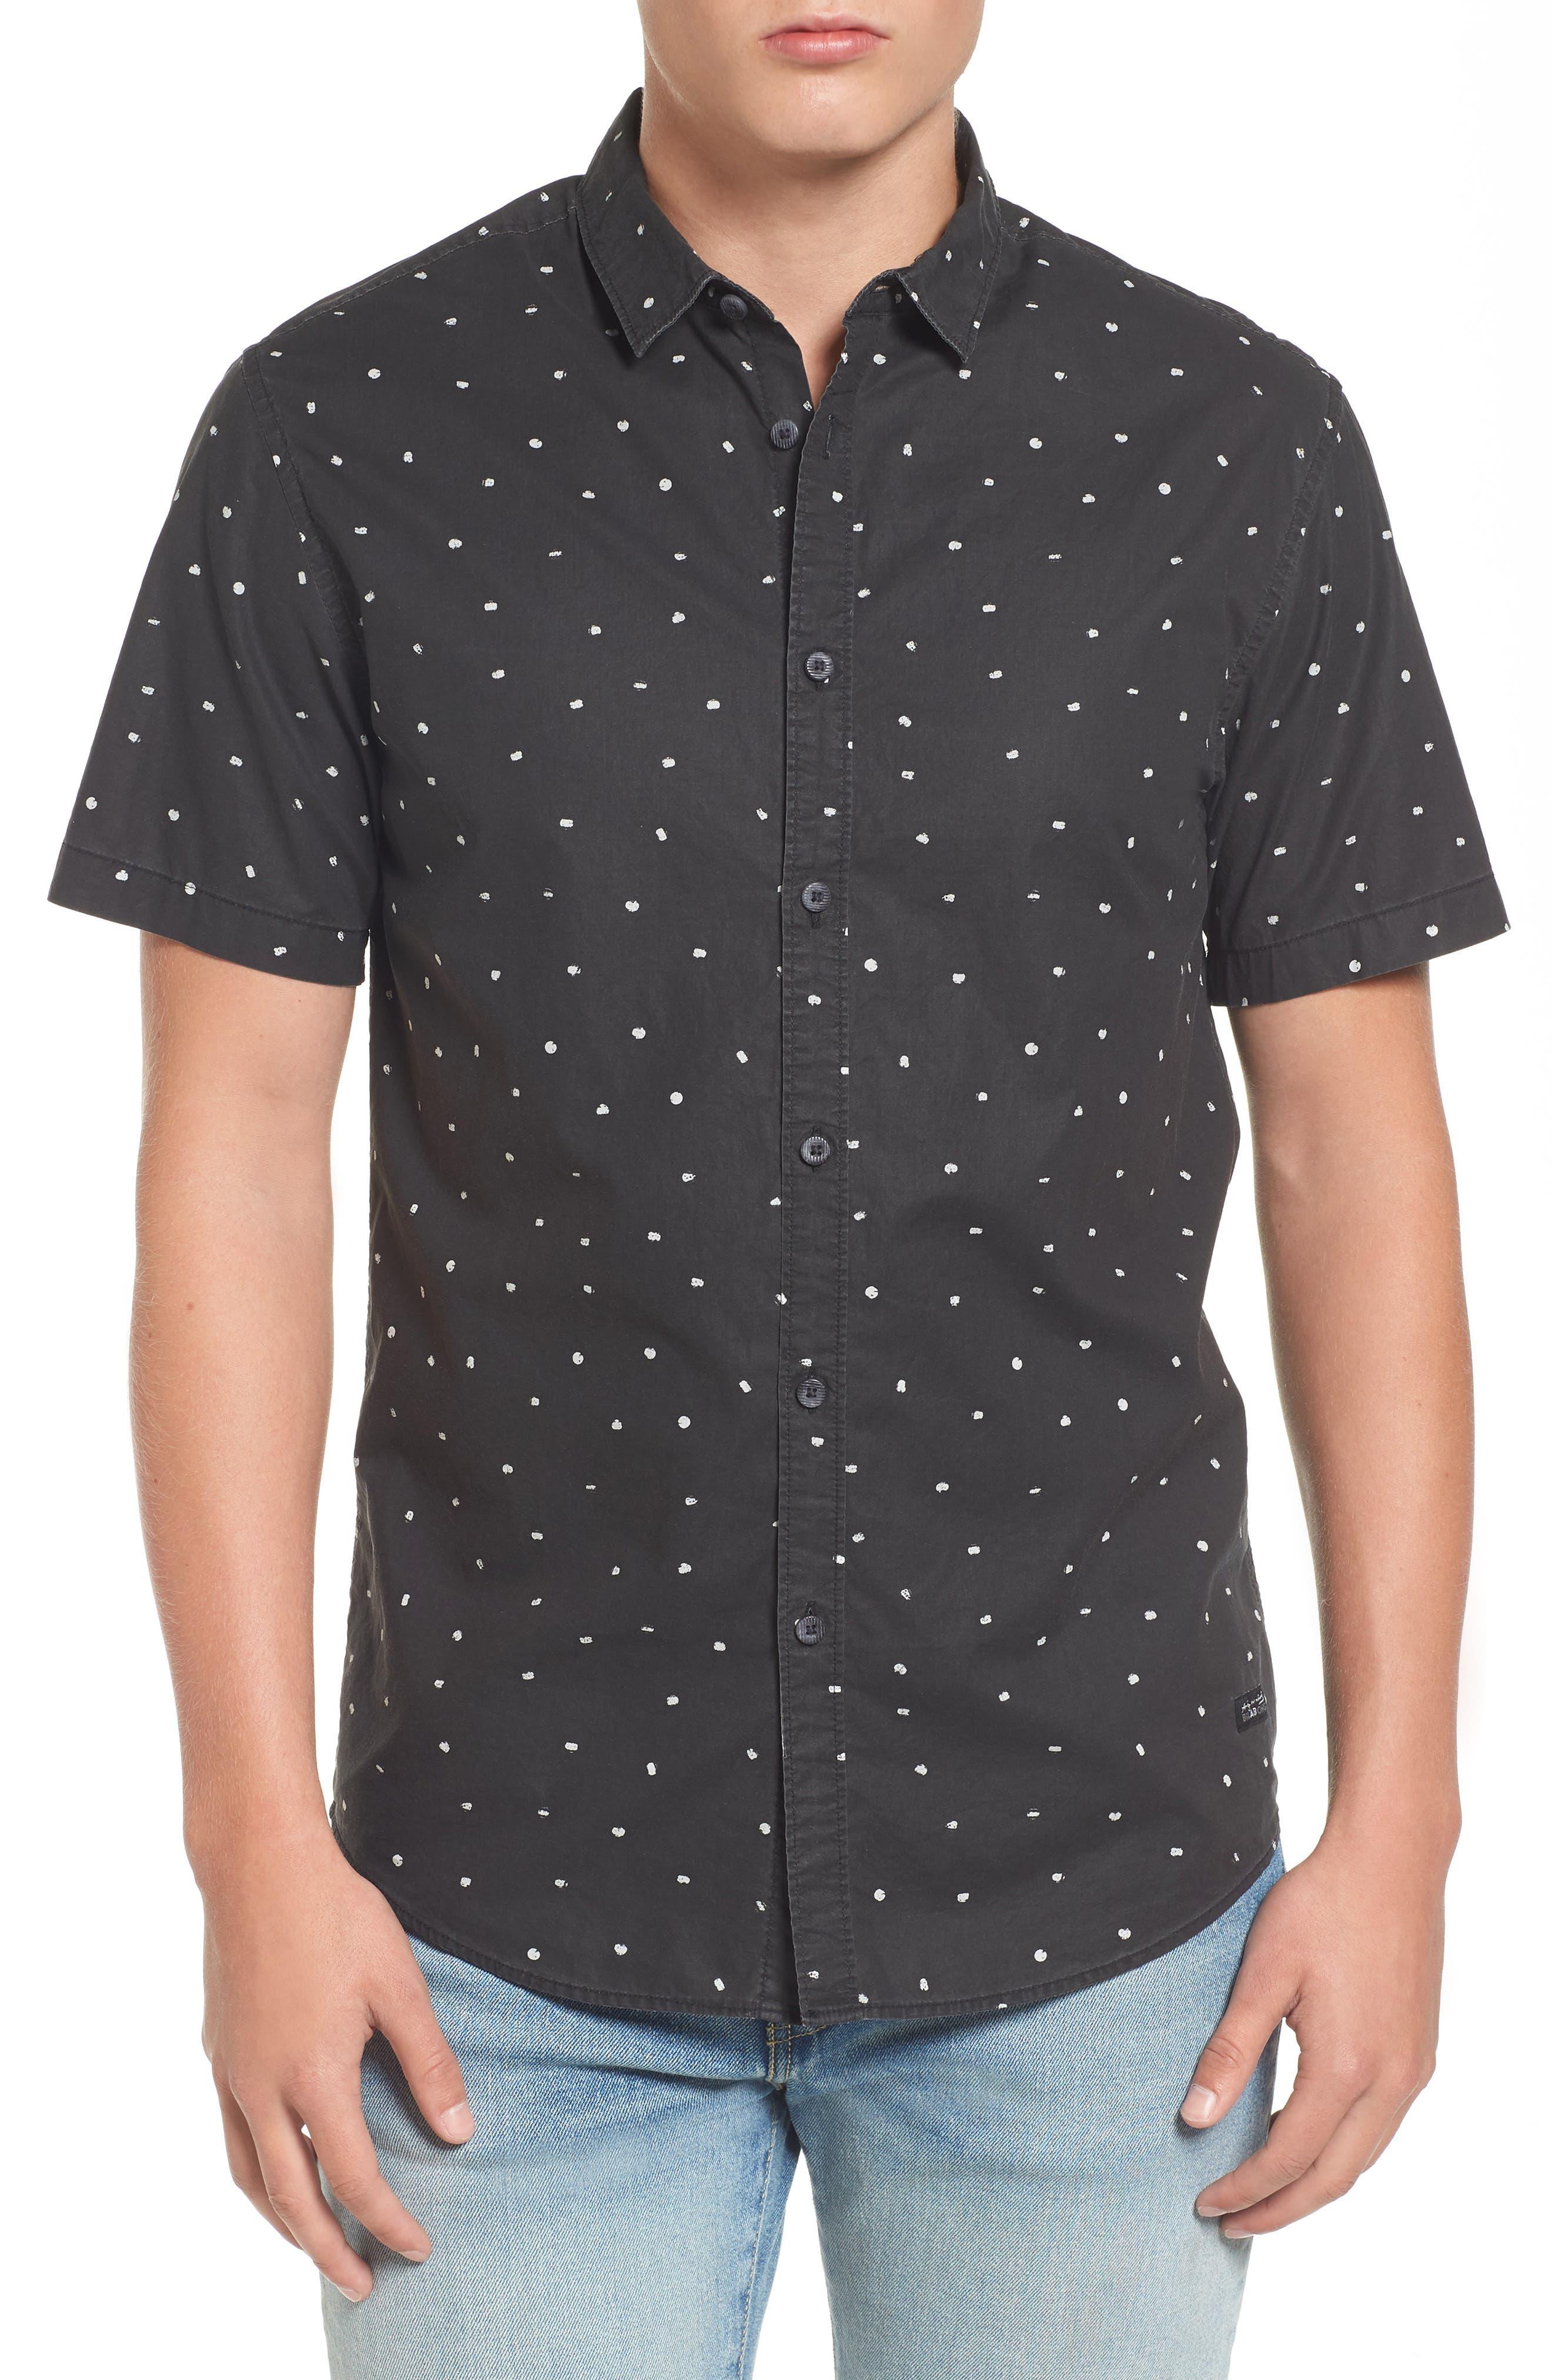 x Warhol Print Woven Cotton Shirt,                         Main,                         color, Black